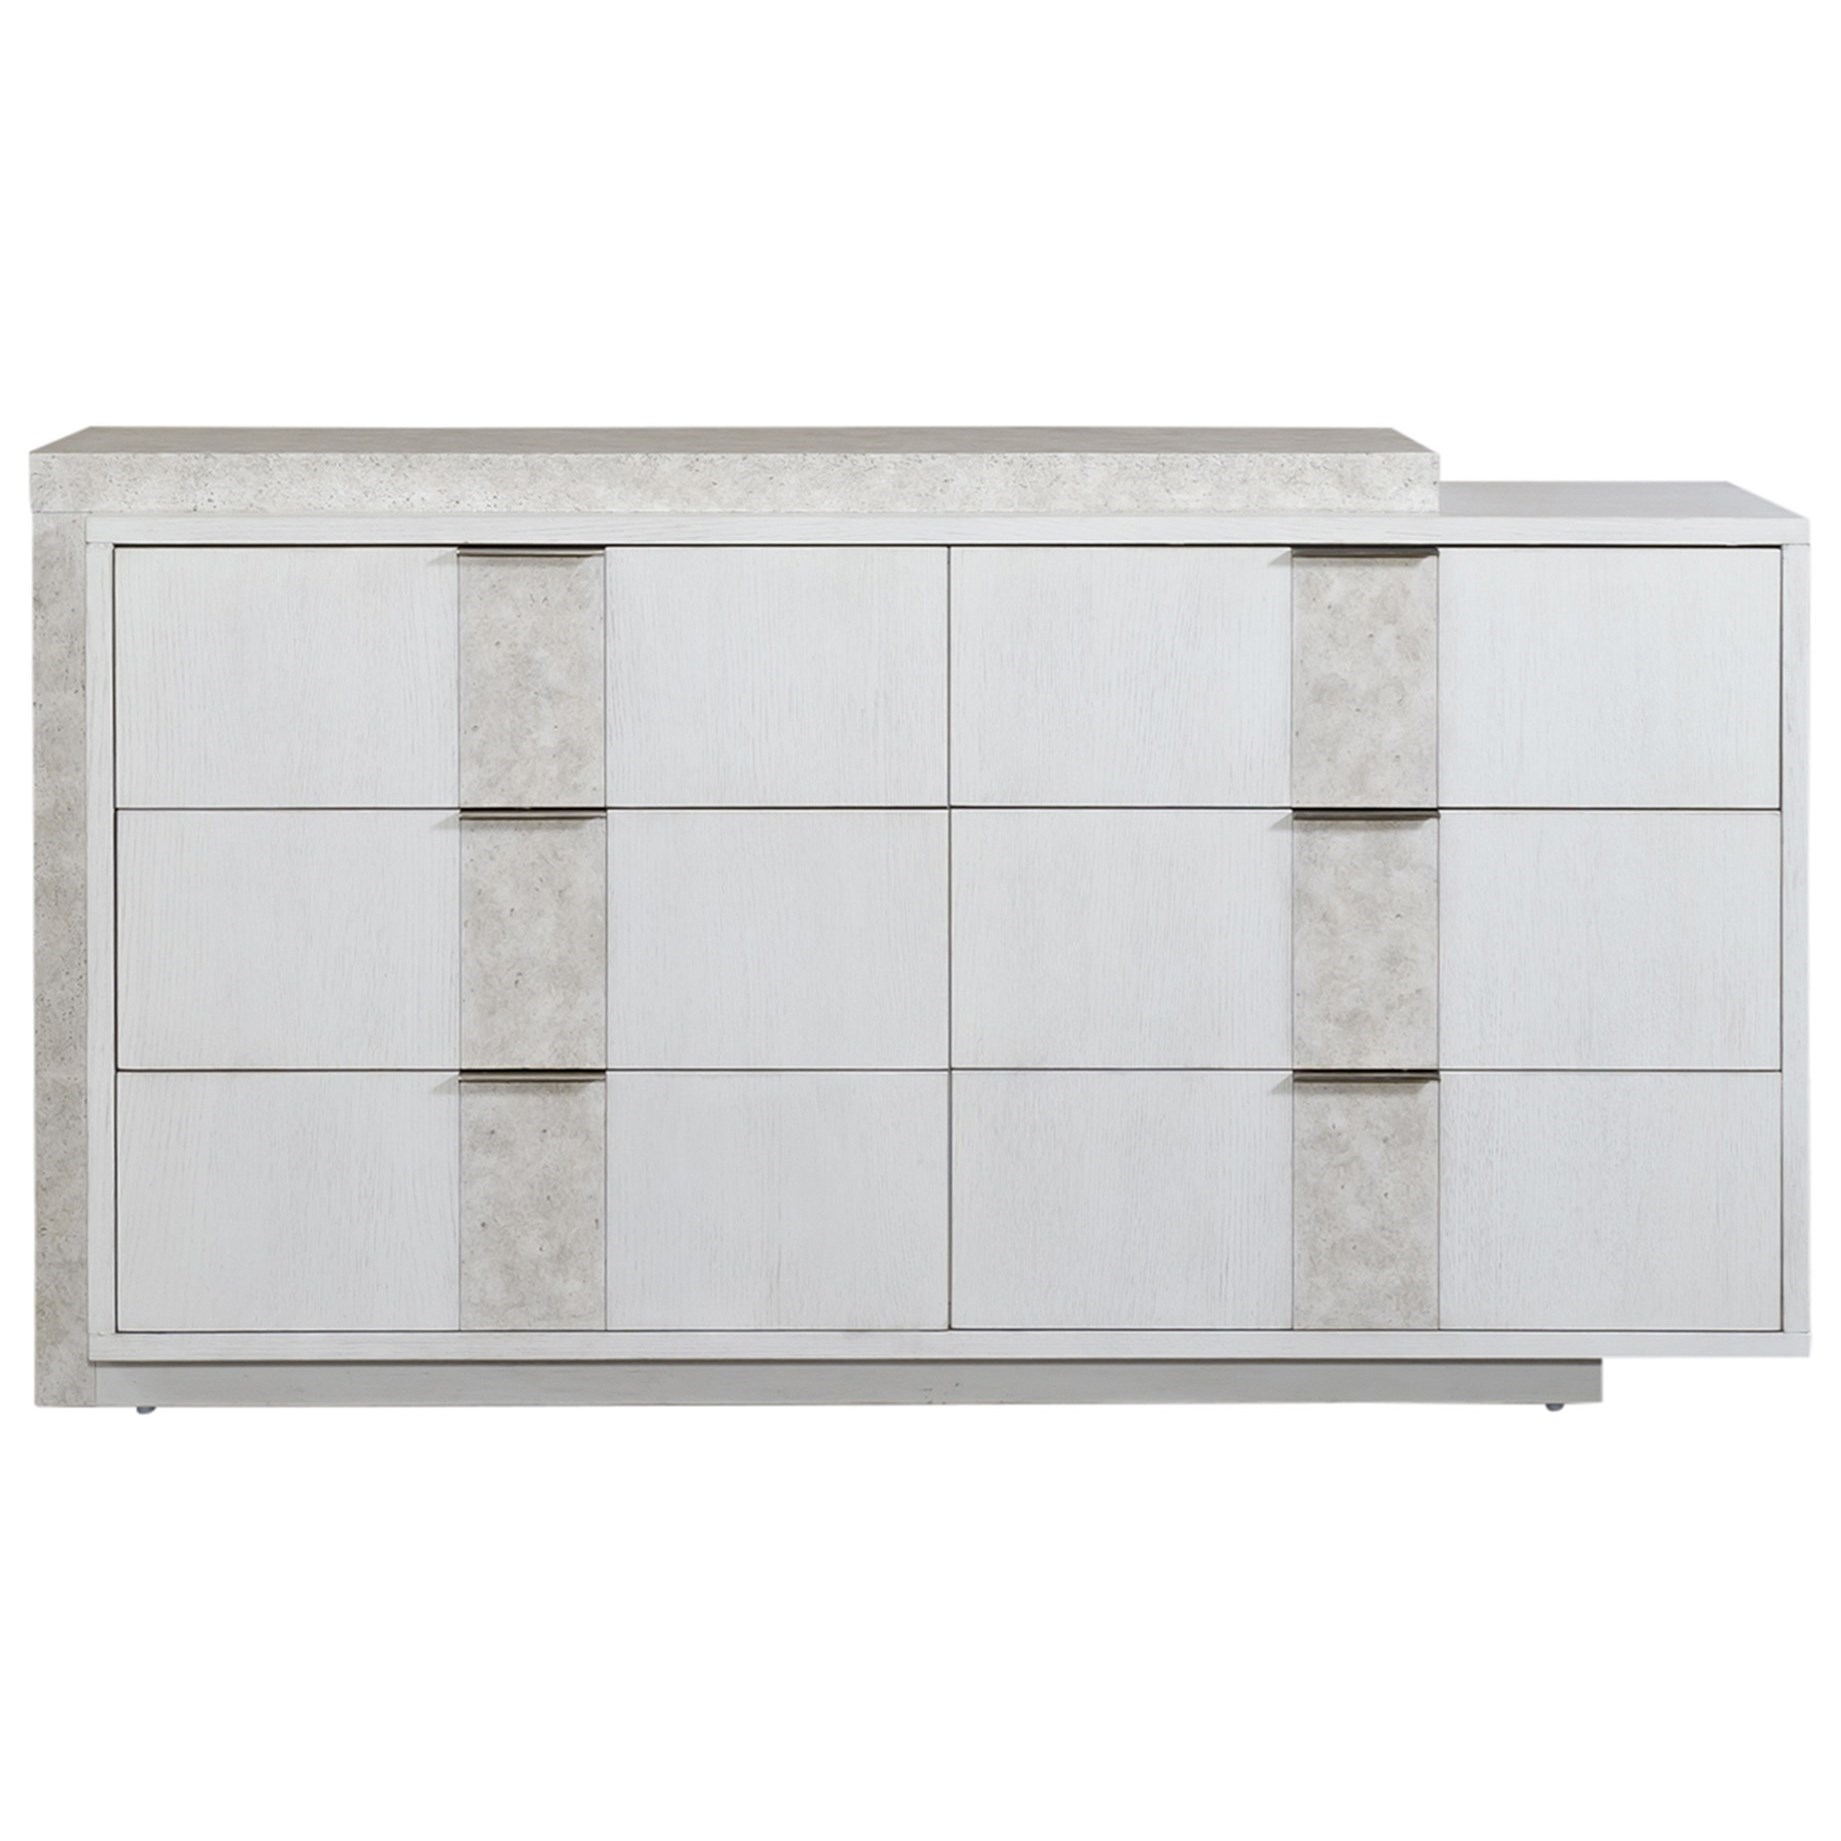 Mirage - 946 6-Drawer Dresser by Libby at Walker's Furniture